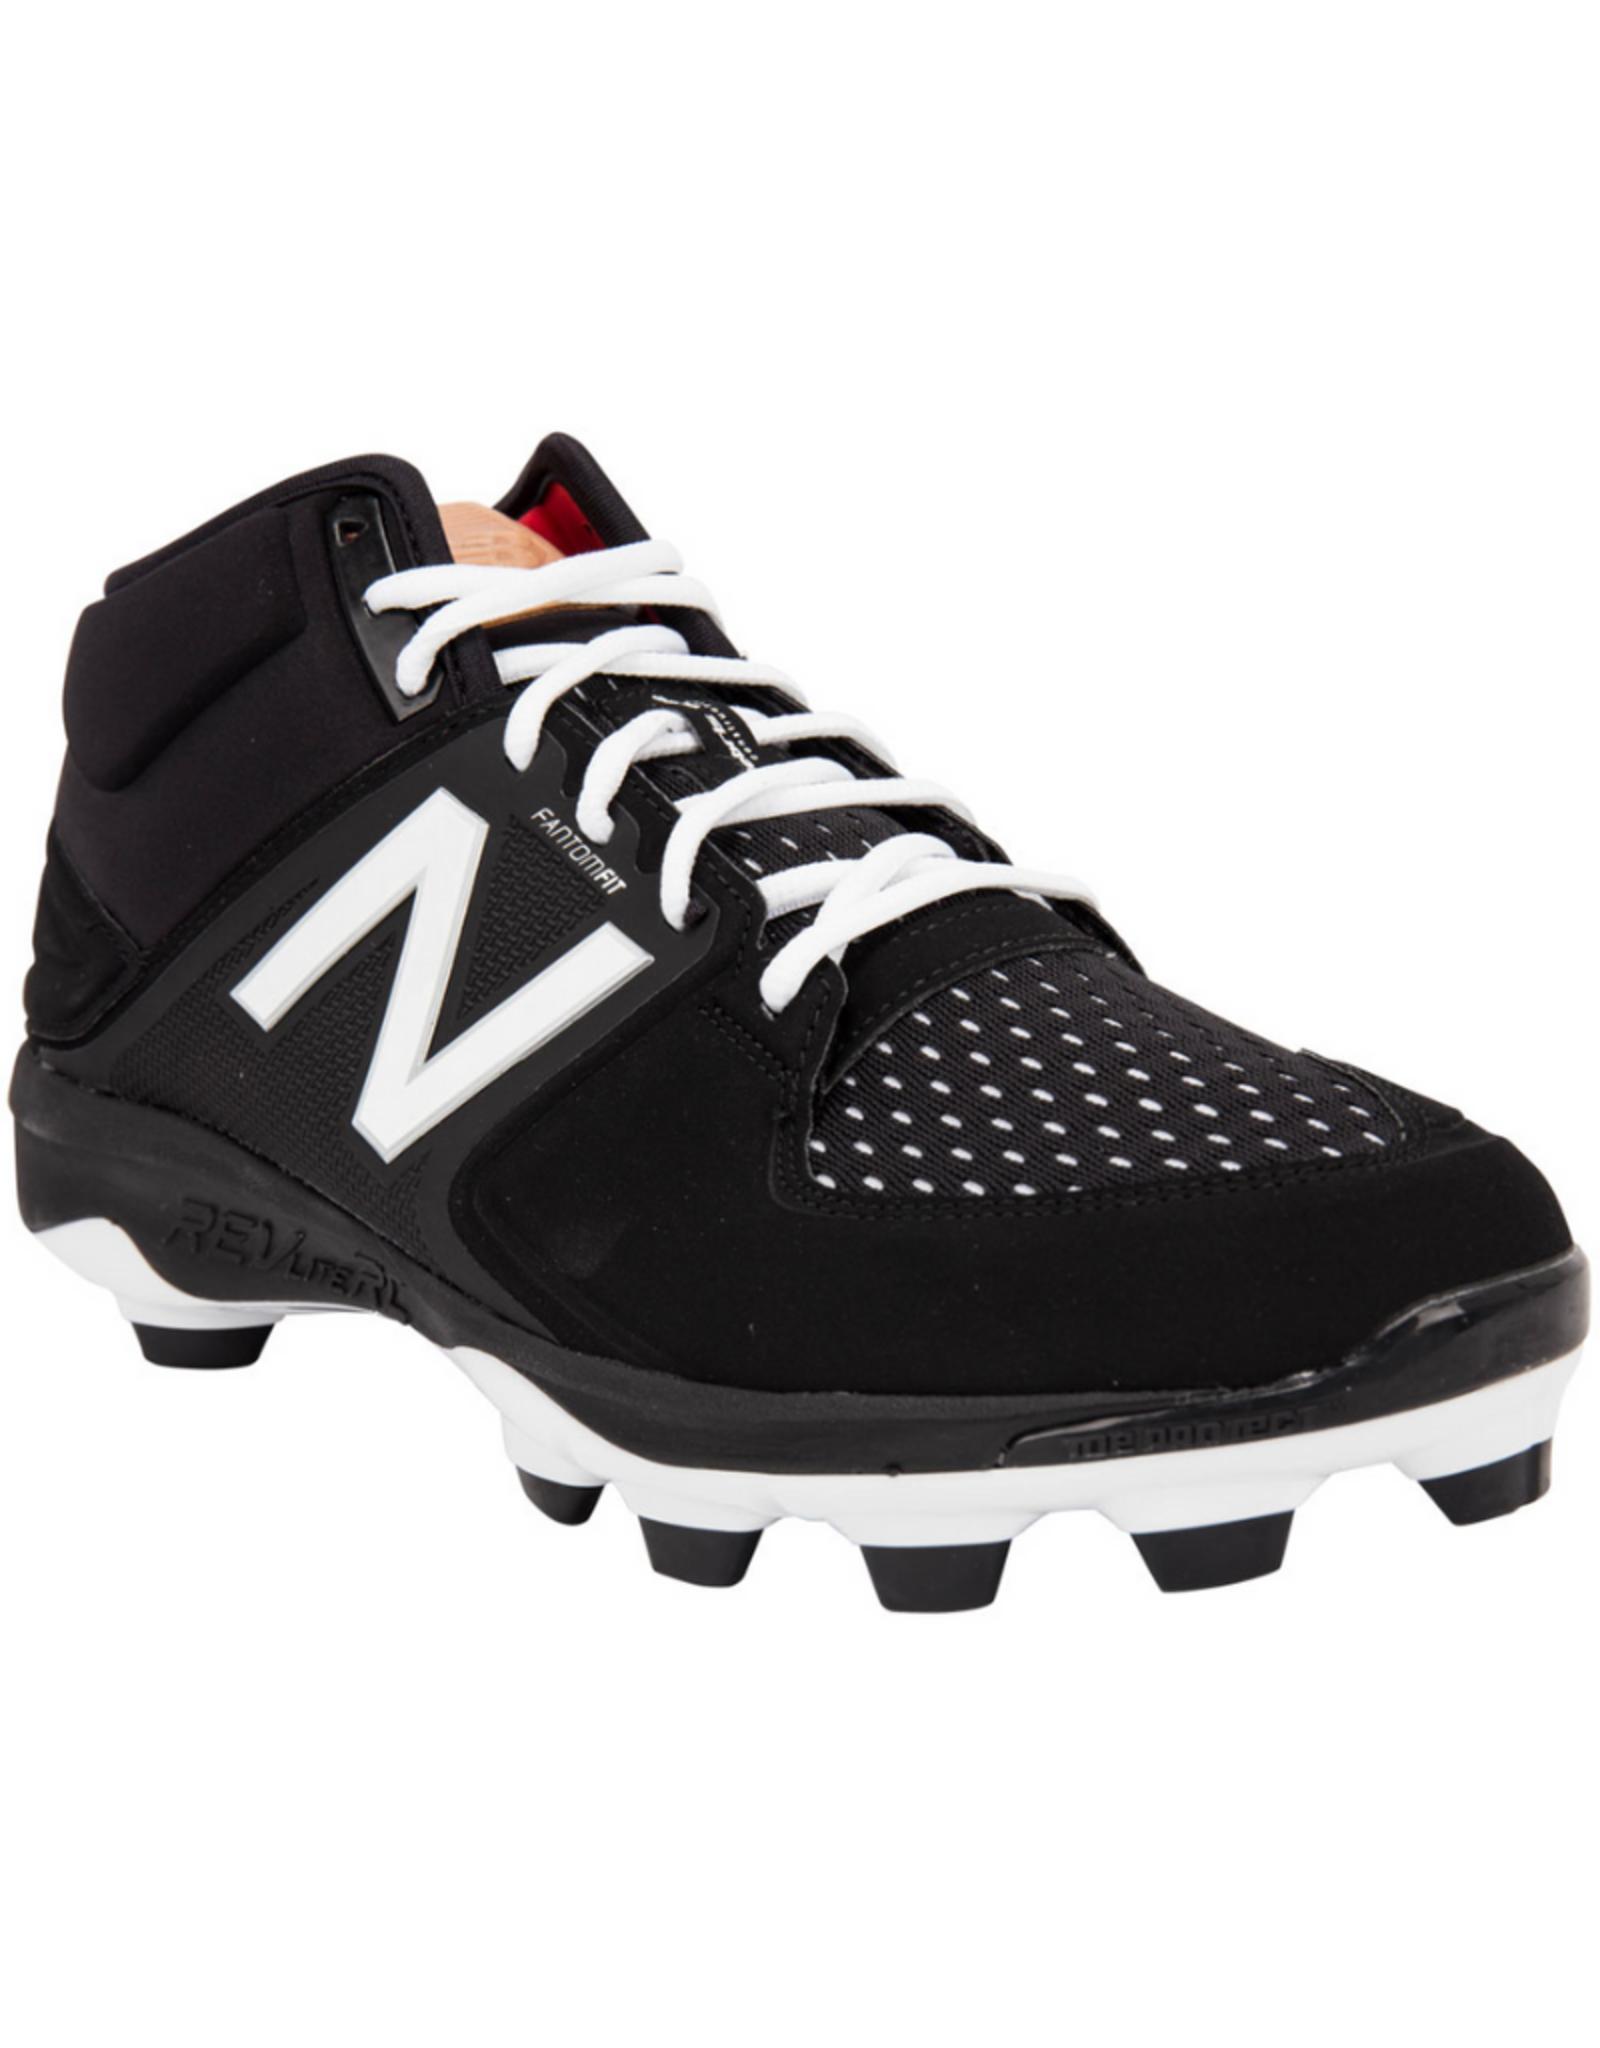 New Balance Men`s Mid Softball Cleats Black